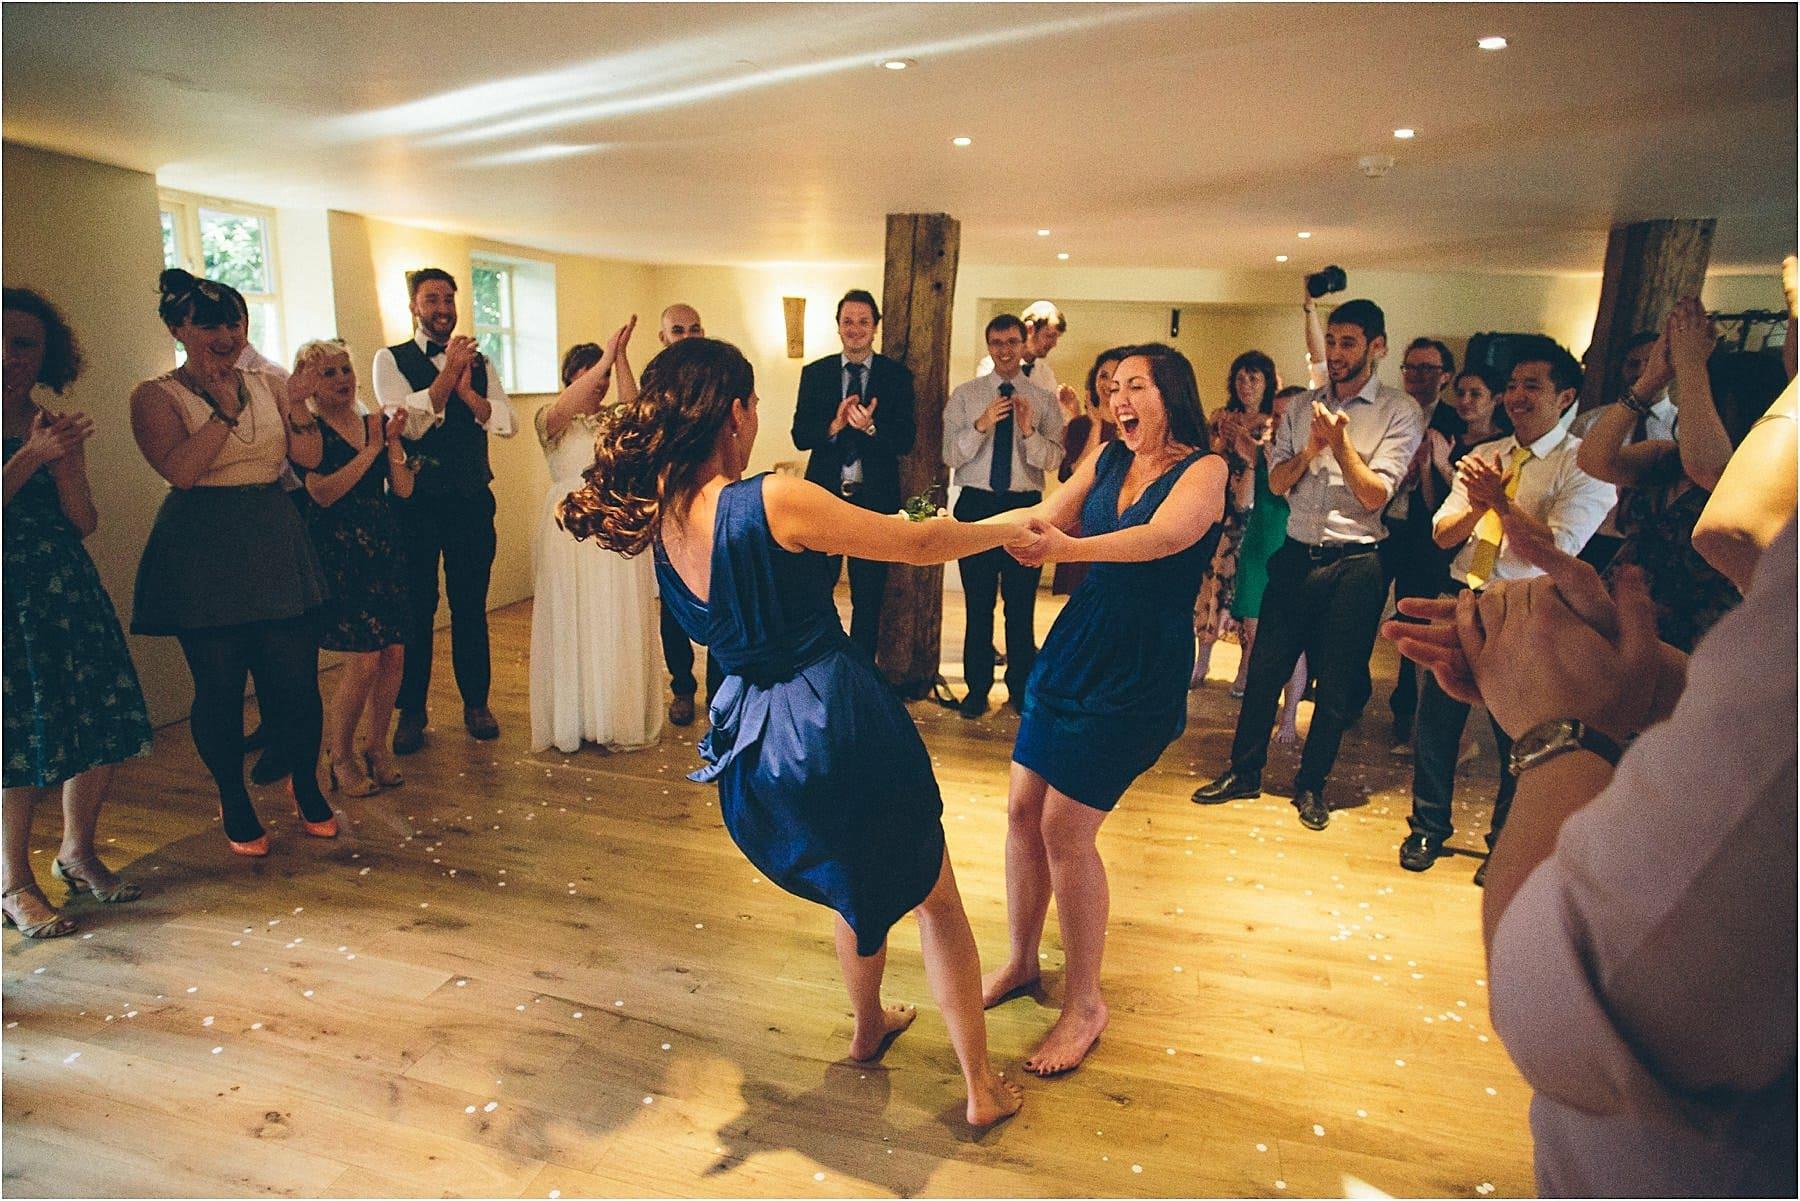 The_Barn_At_Bury_Court_Wedding_090